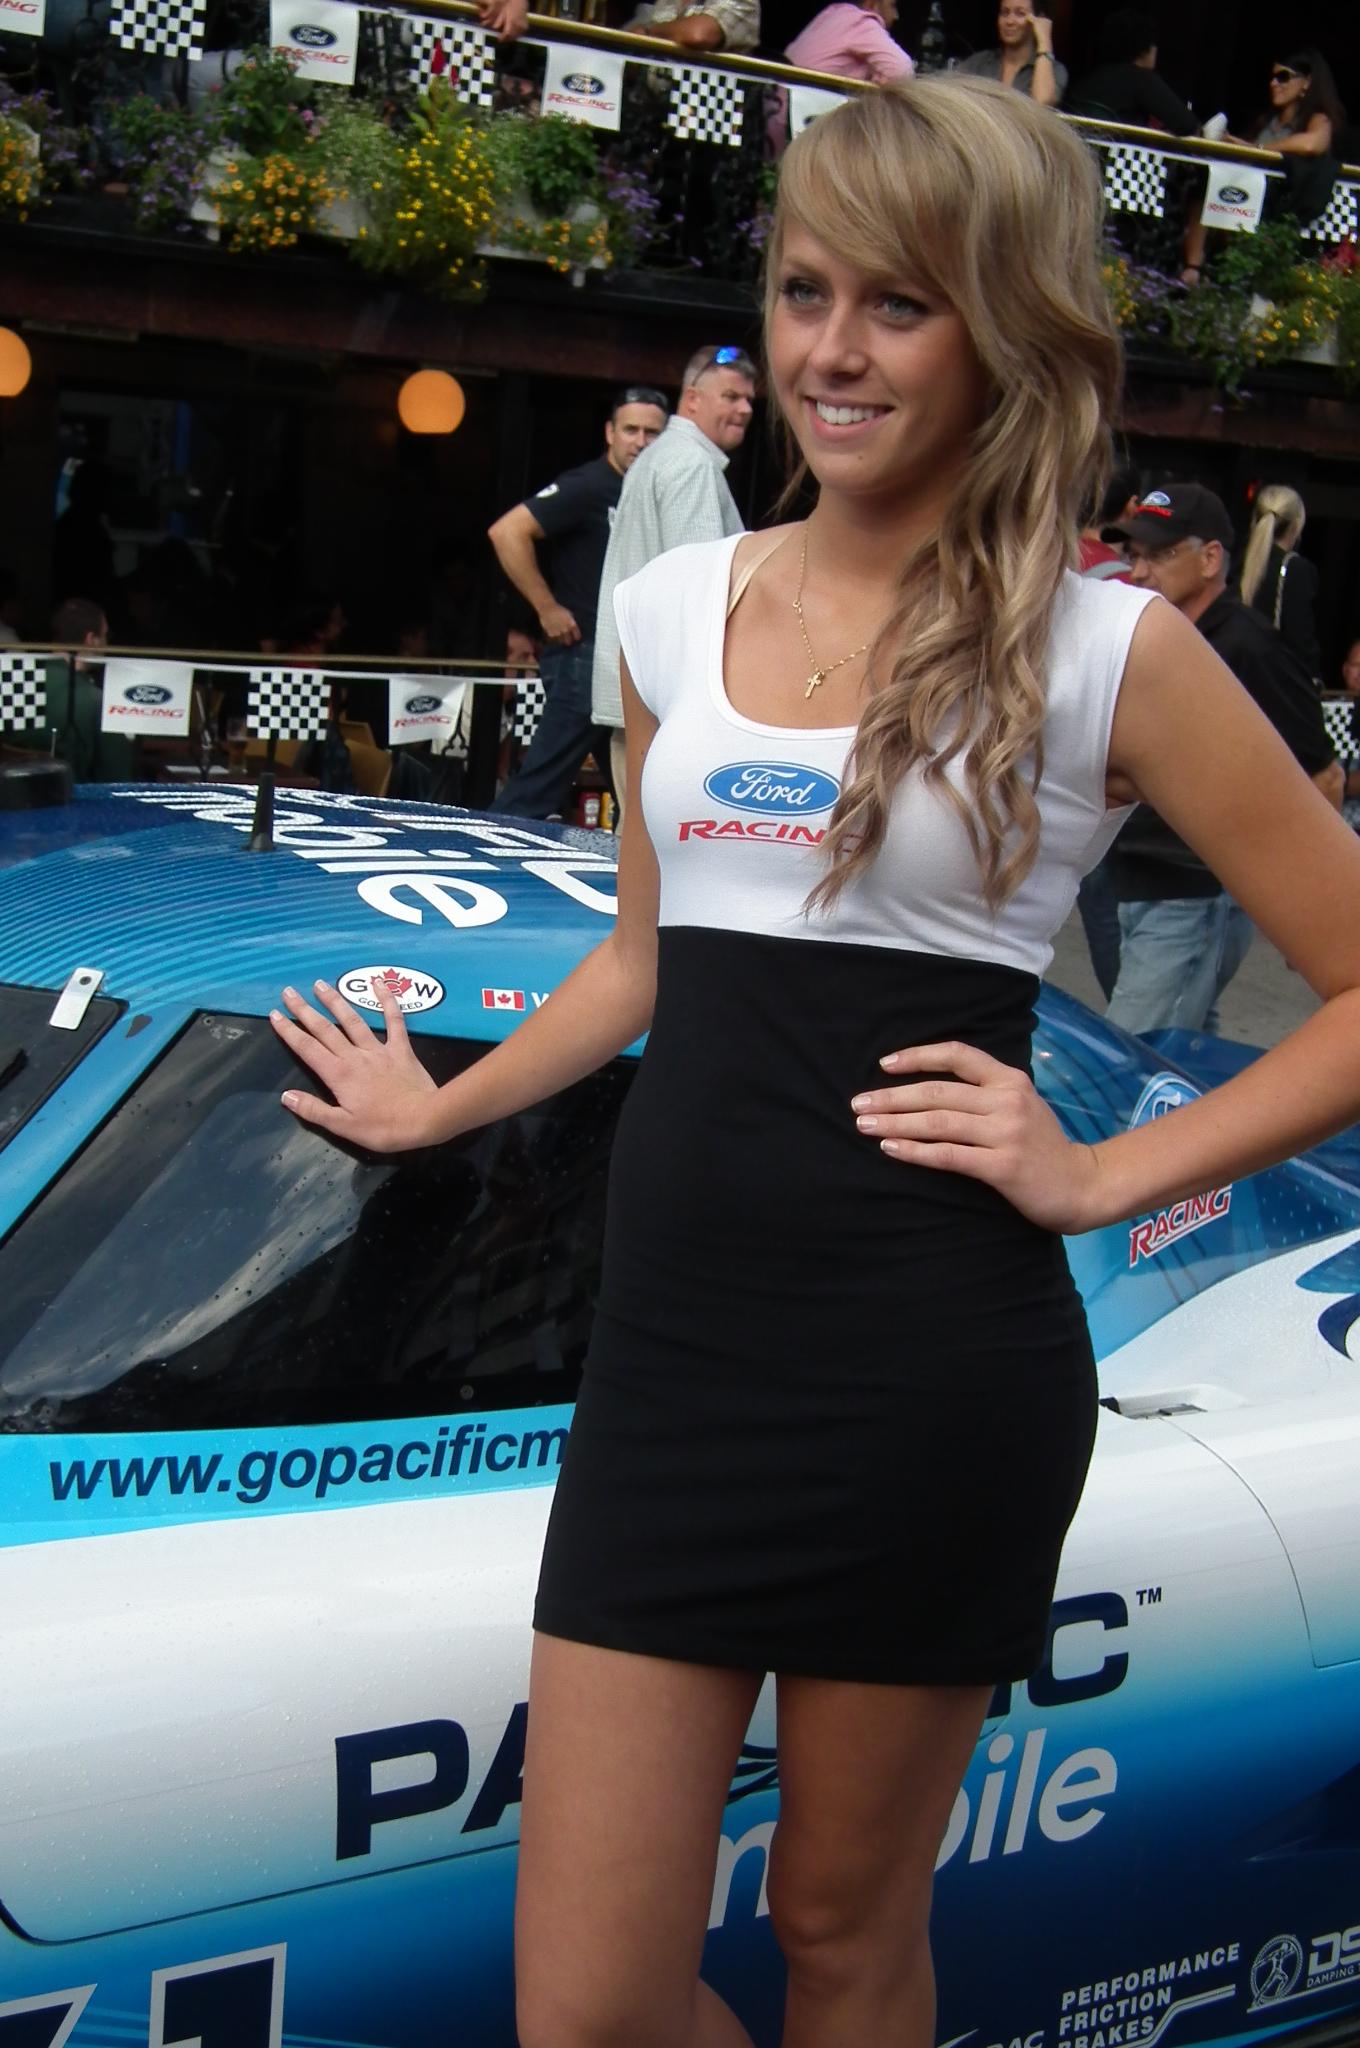 Ford Racing Girls Ford racing girls, ford racing festival, fuji hs10 ...